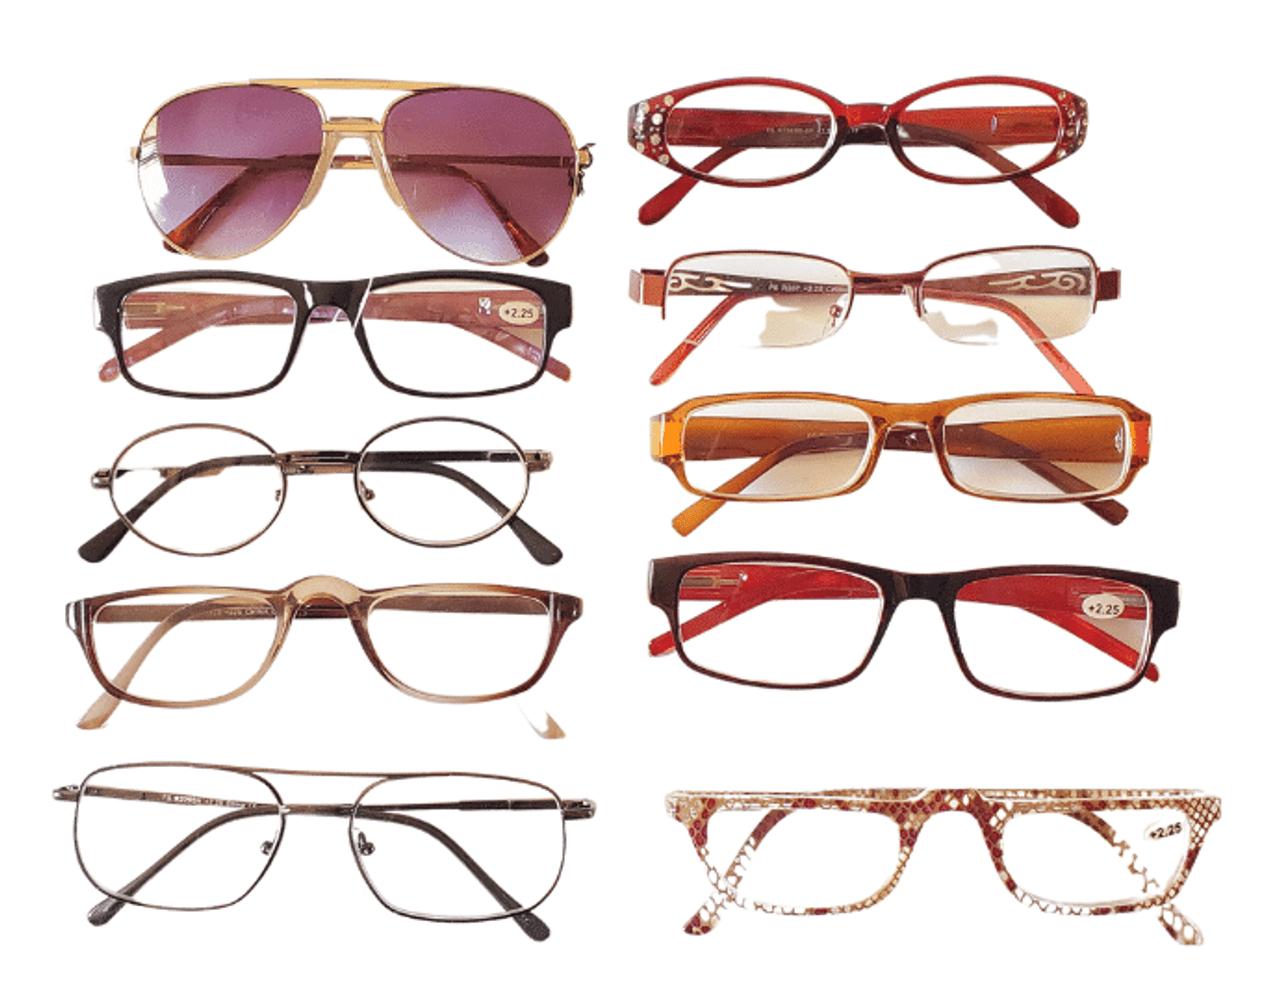 Assorted Reading Glasses for Women